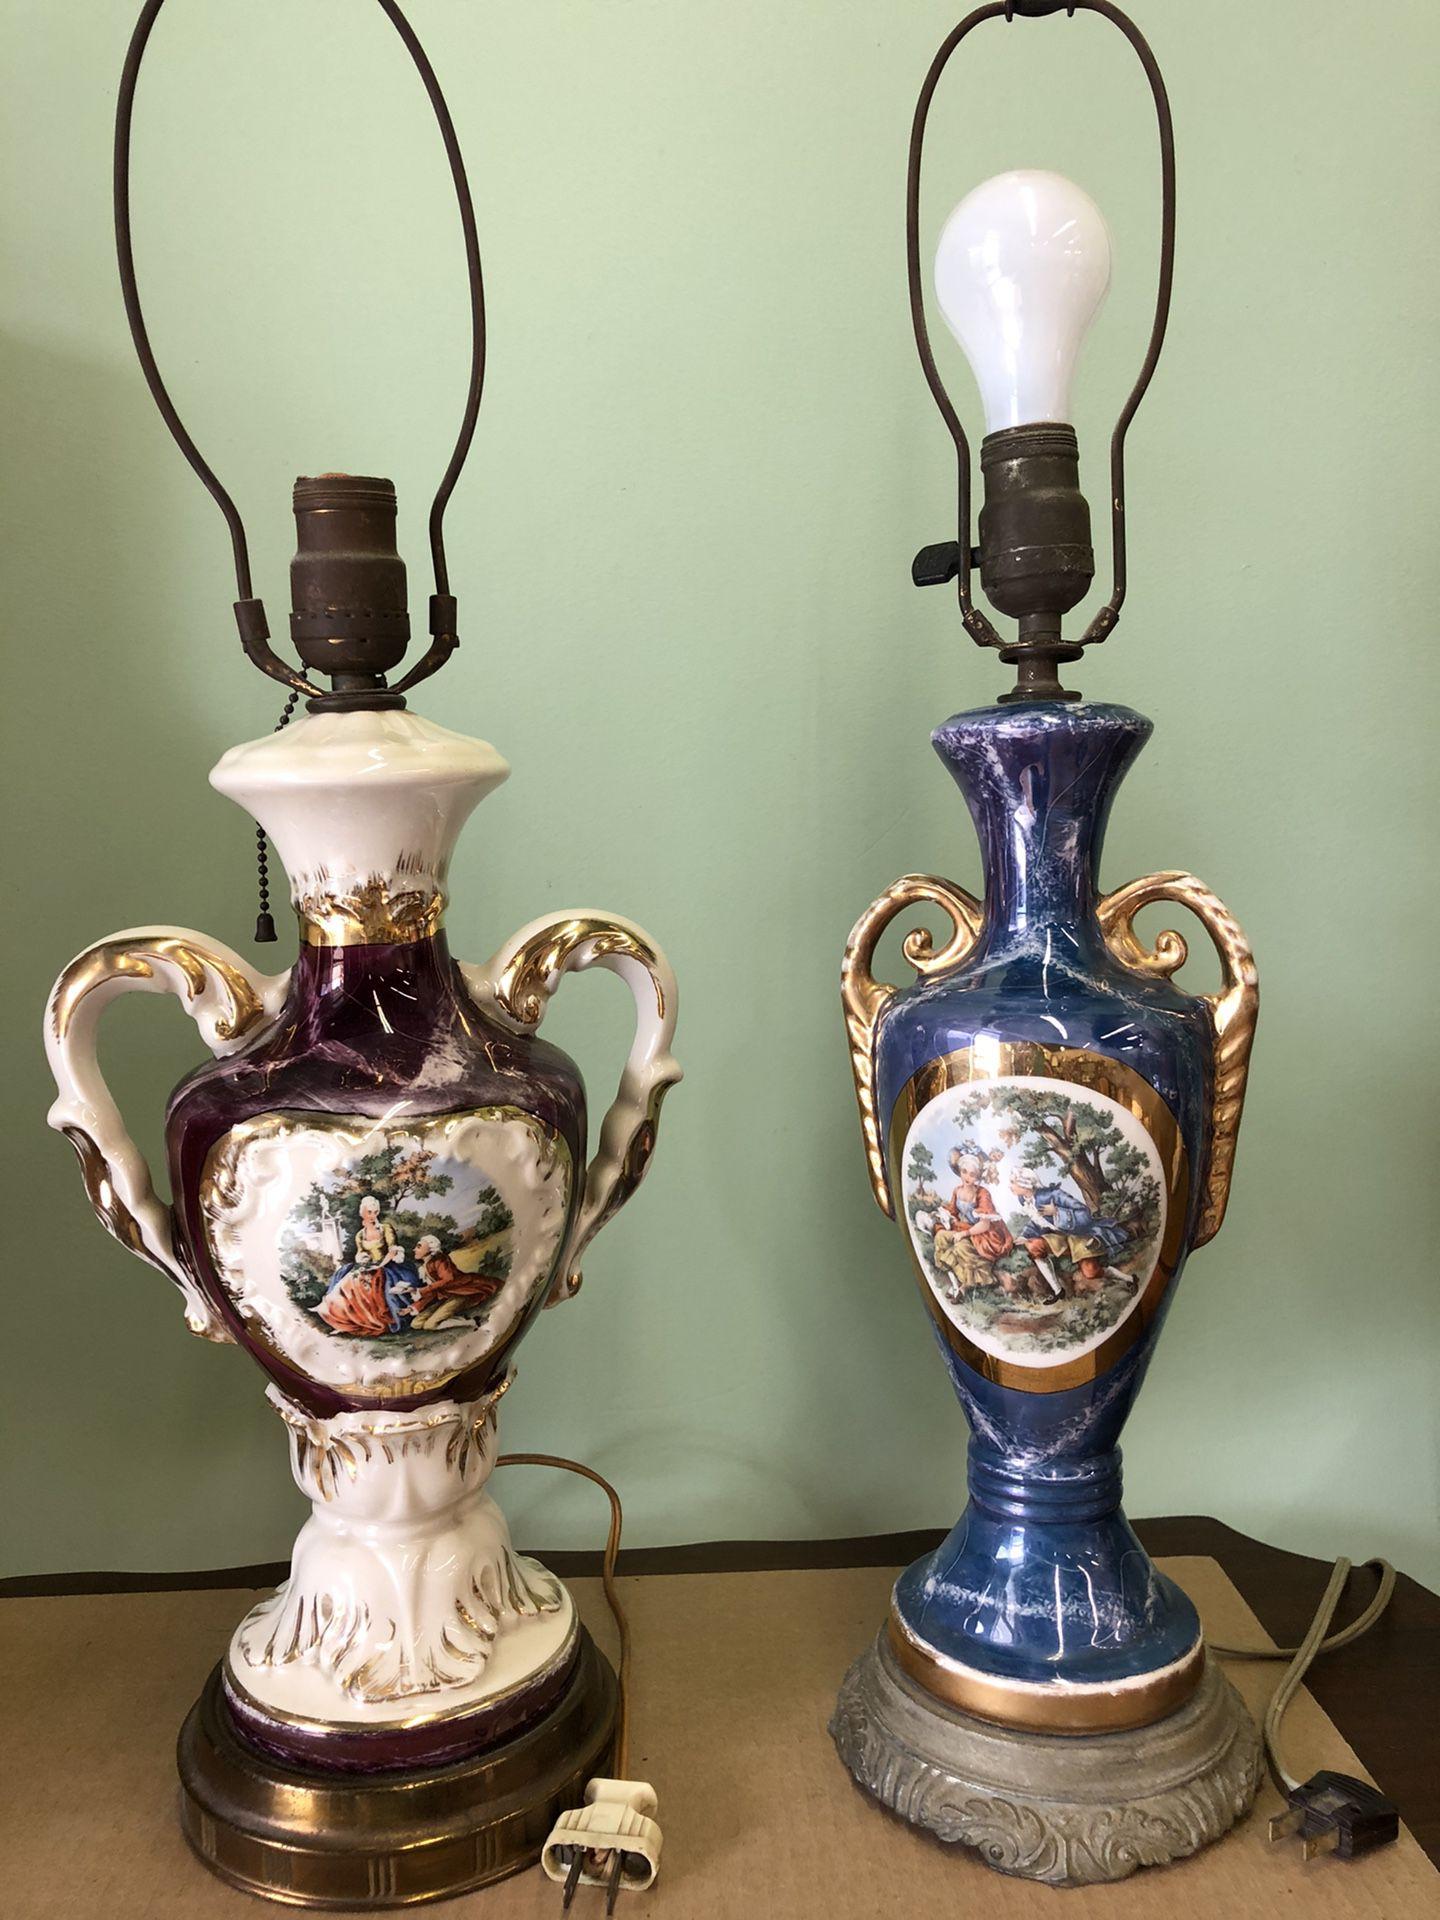 Vintage British Lamps